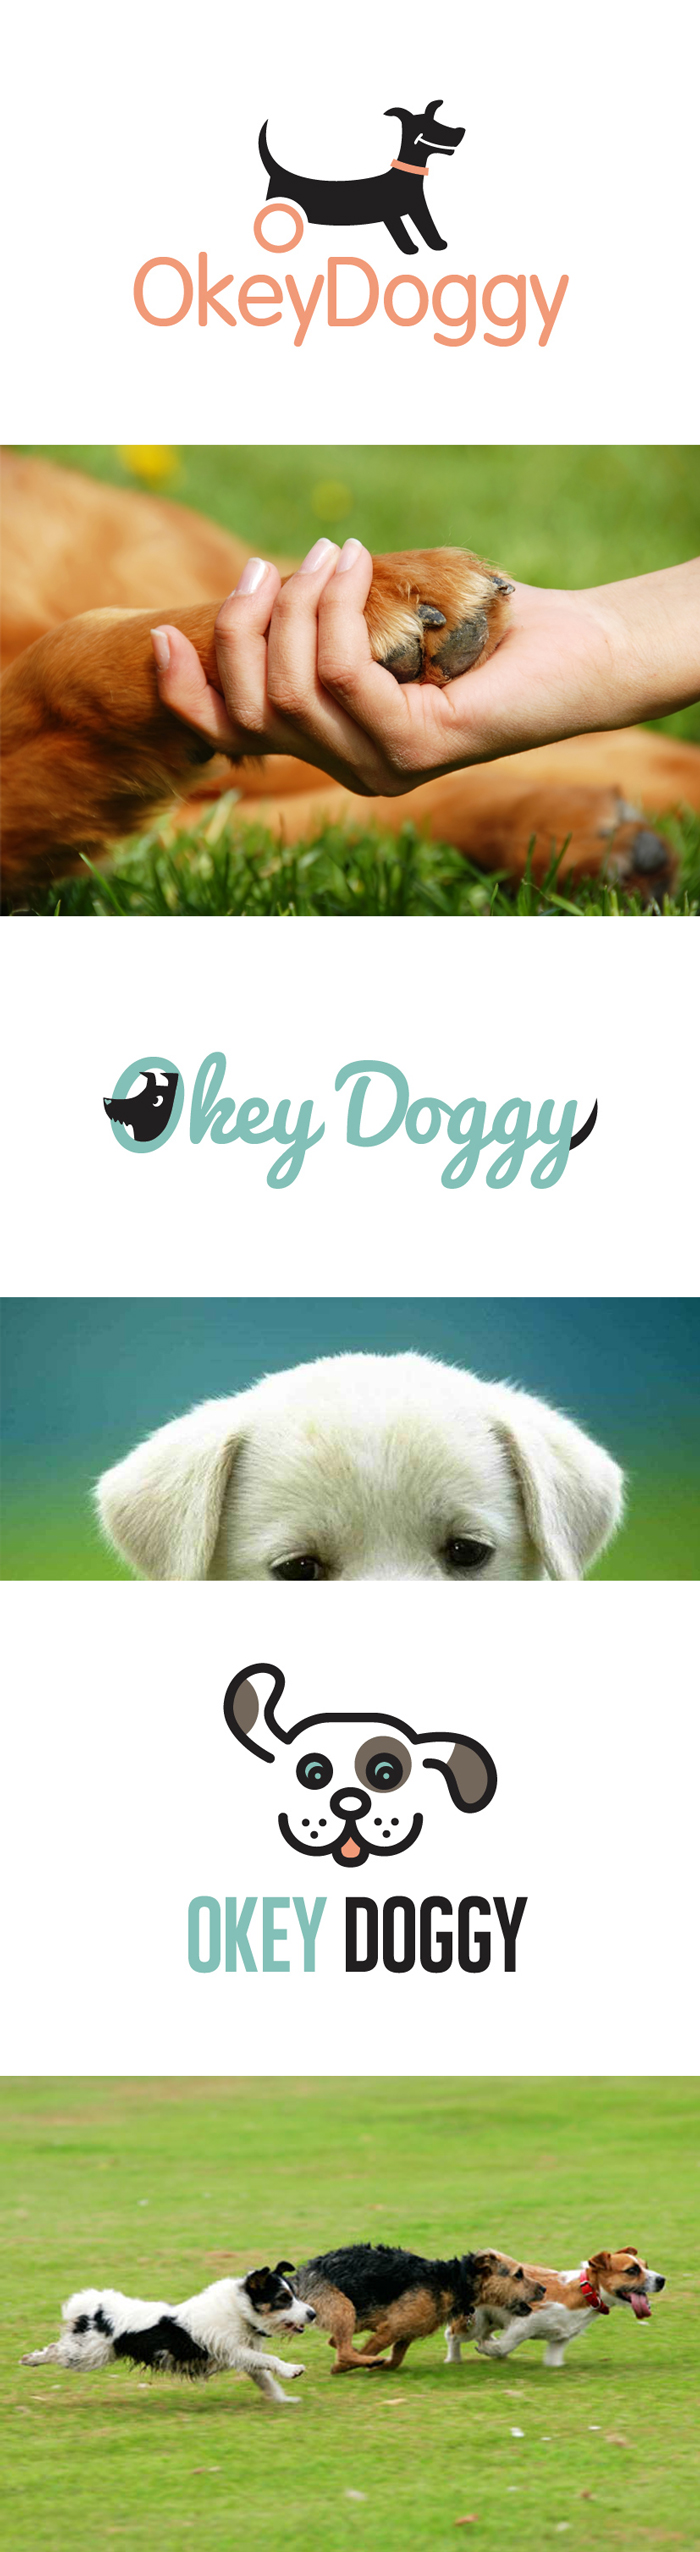 Логотип для компании производителя инвалидных колясок для собак OkeyDoggy